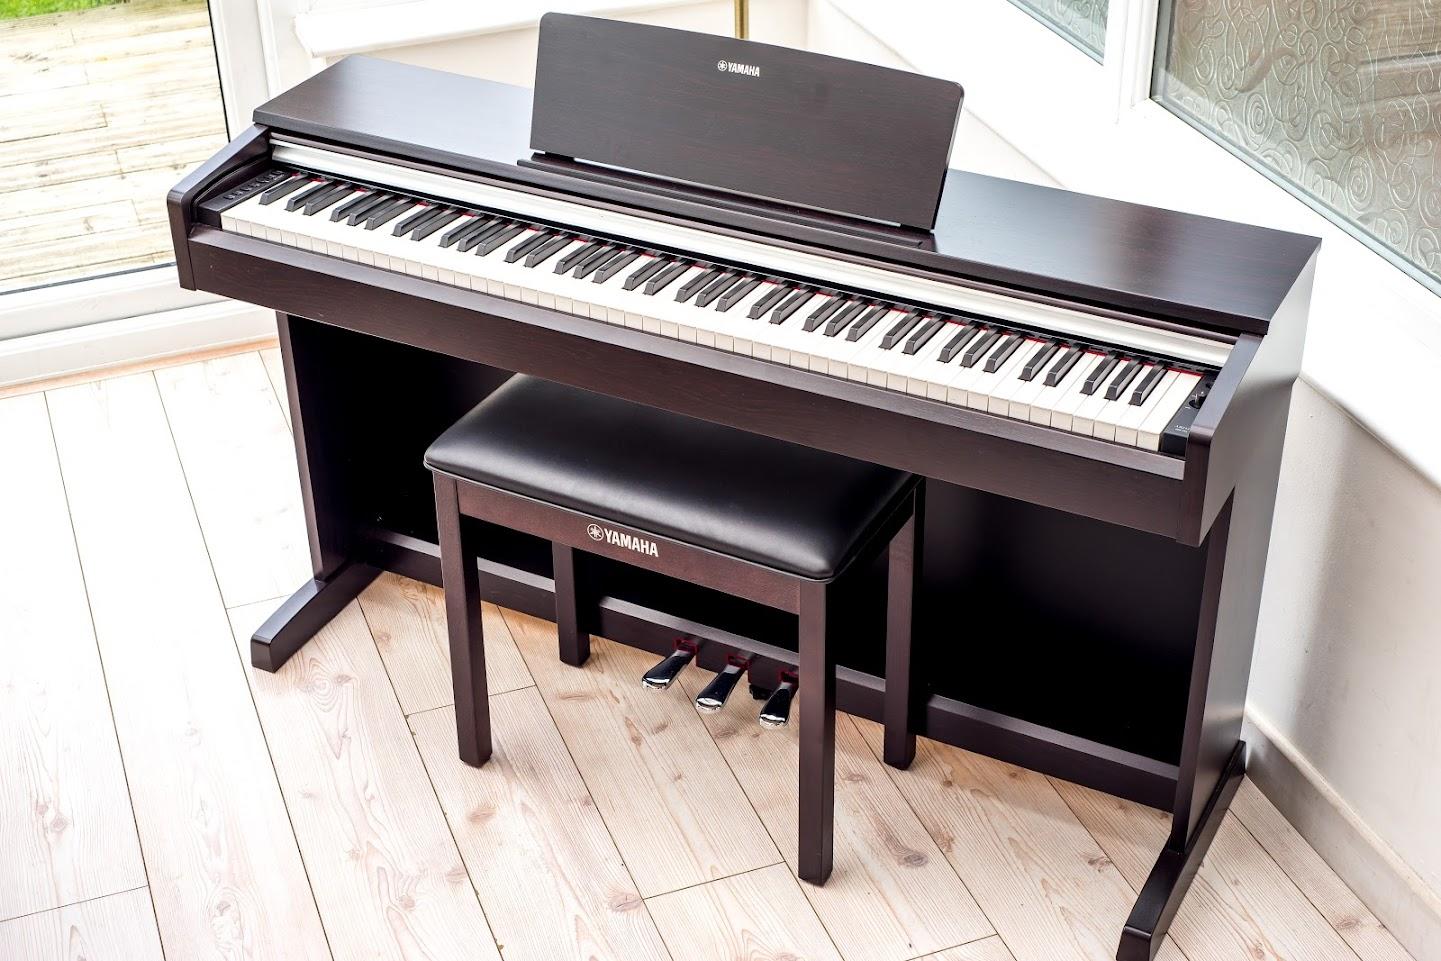 Yamaha Weighted Keyboard : yamaha arius ydp 142 full size digital piano 88 key weighted keyboard stool ebay ~ Russianpoet.info Haus und Dekorationen